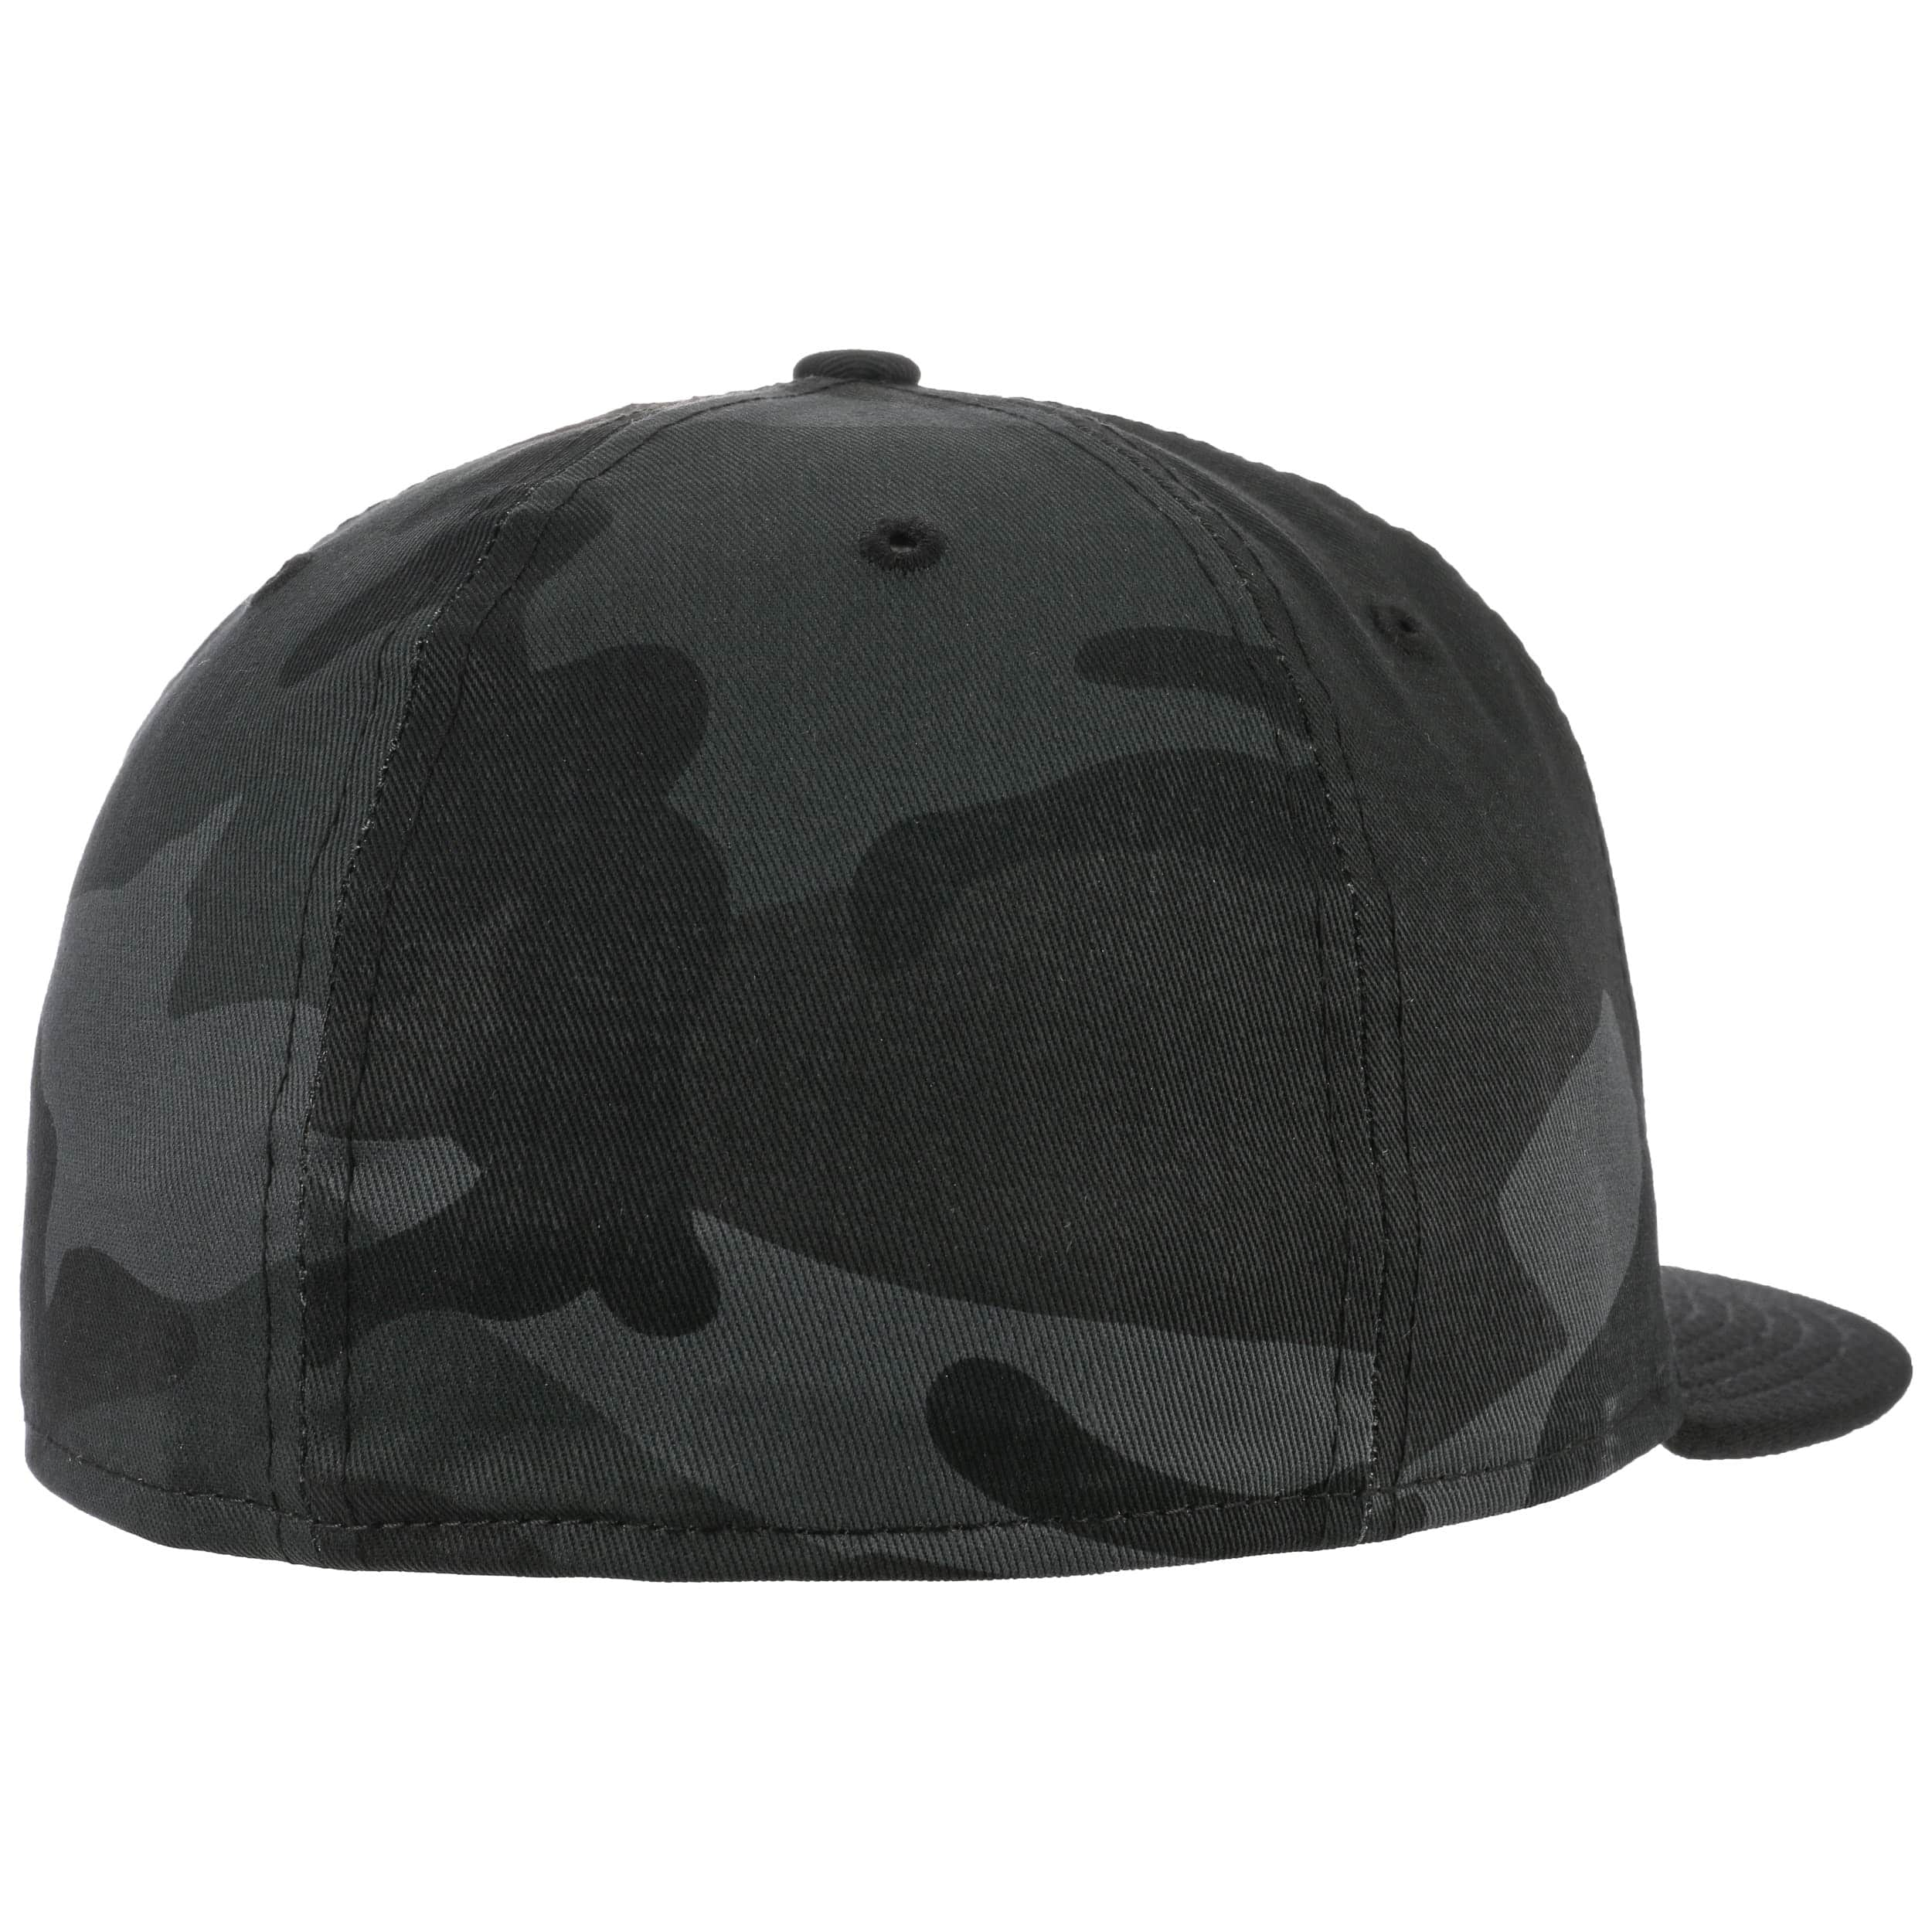 Cappellino 59Fifty Camo Batman Fitted New Era baseball cap berretto baseball fitted cap